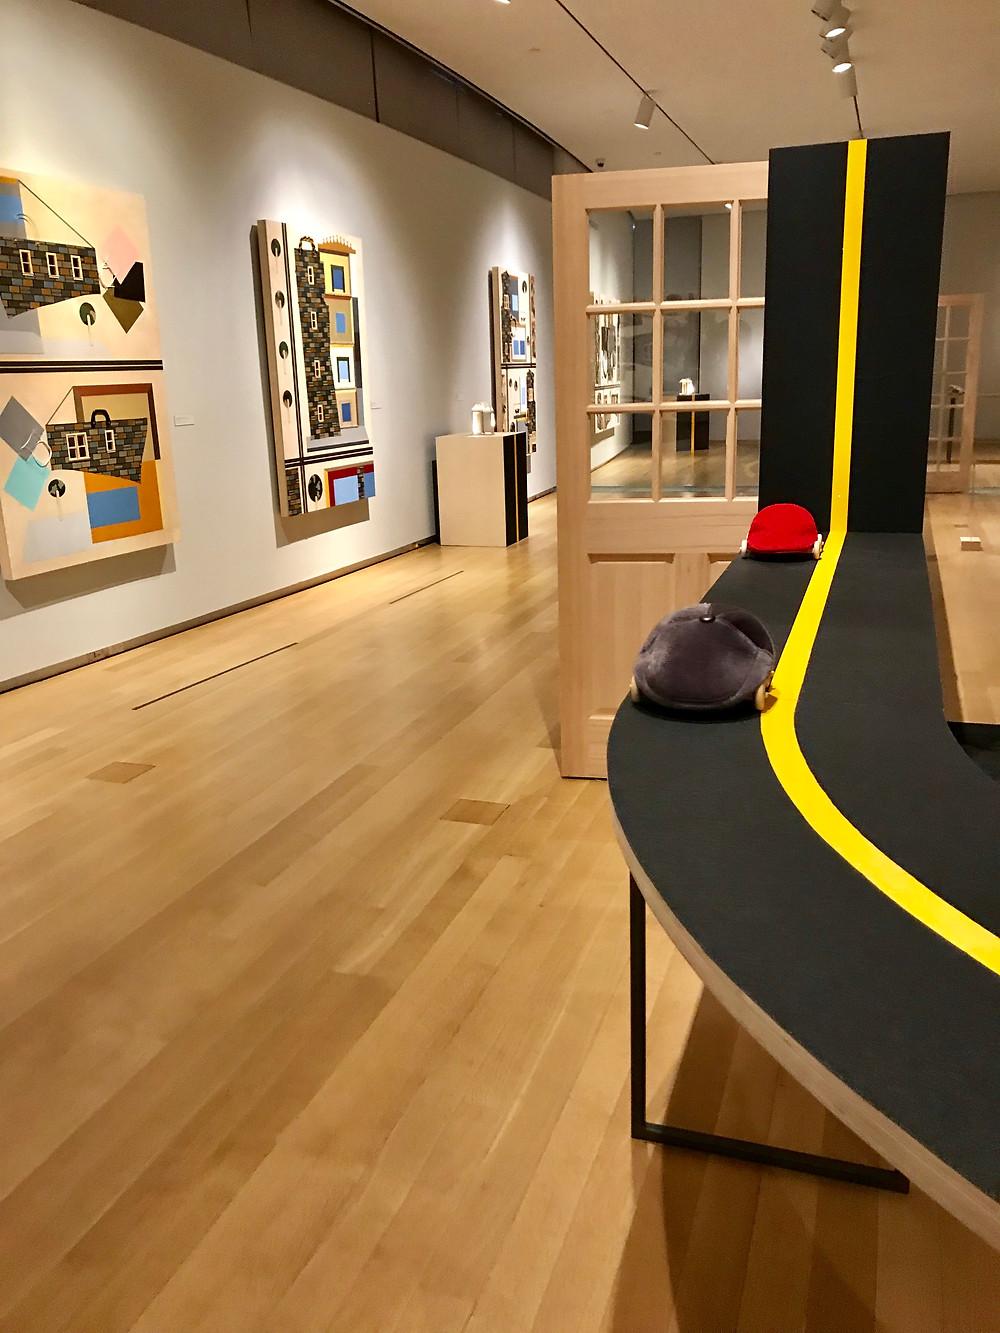 Museum of Art and Design, Samantha Littman, Tanya Aguiniga, Derrick Adams, Interlace, Craft and Care, Surface Depth